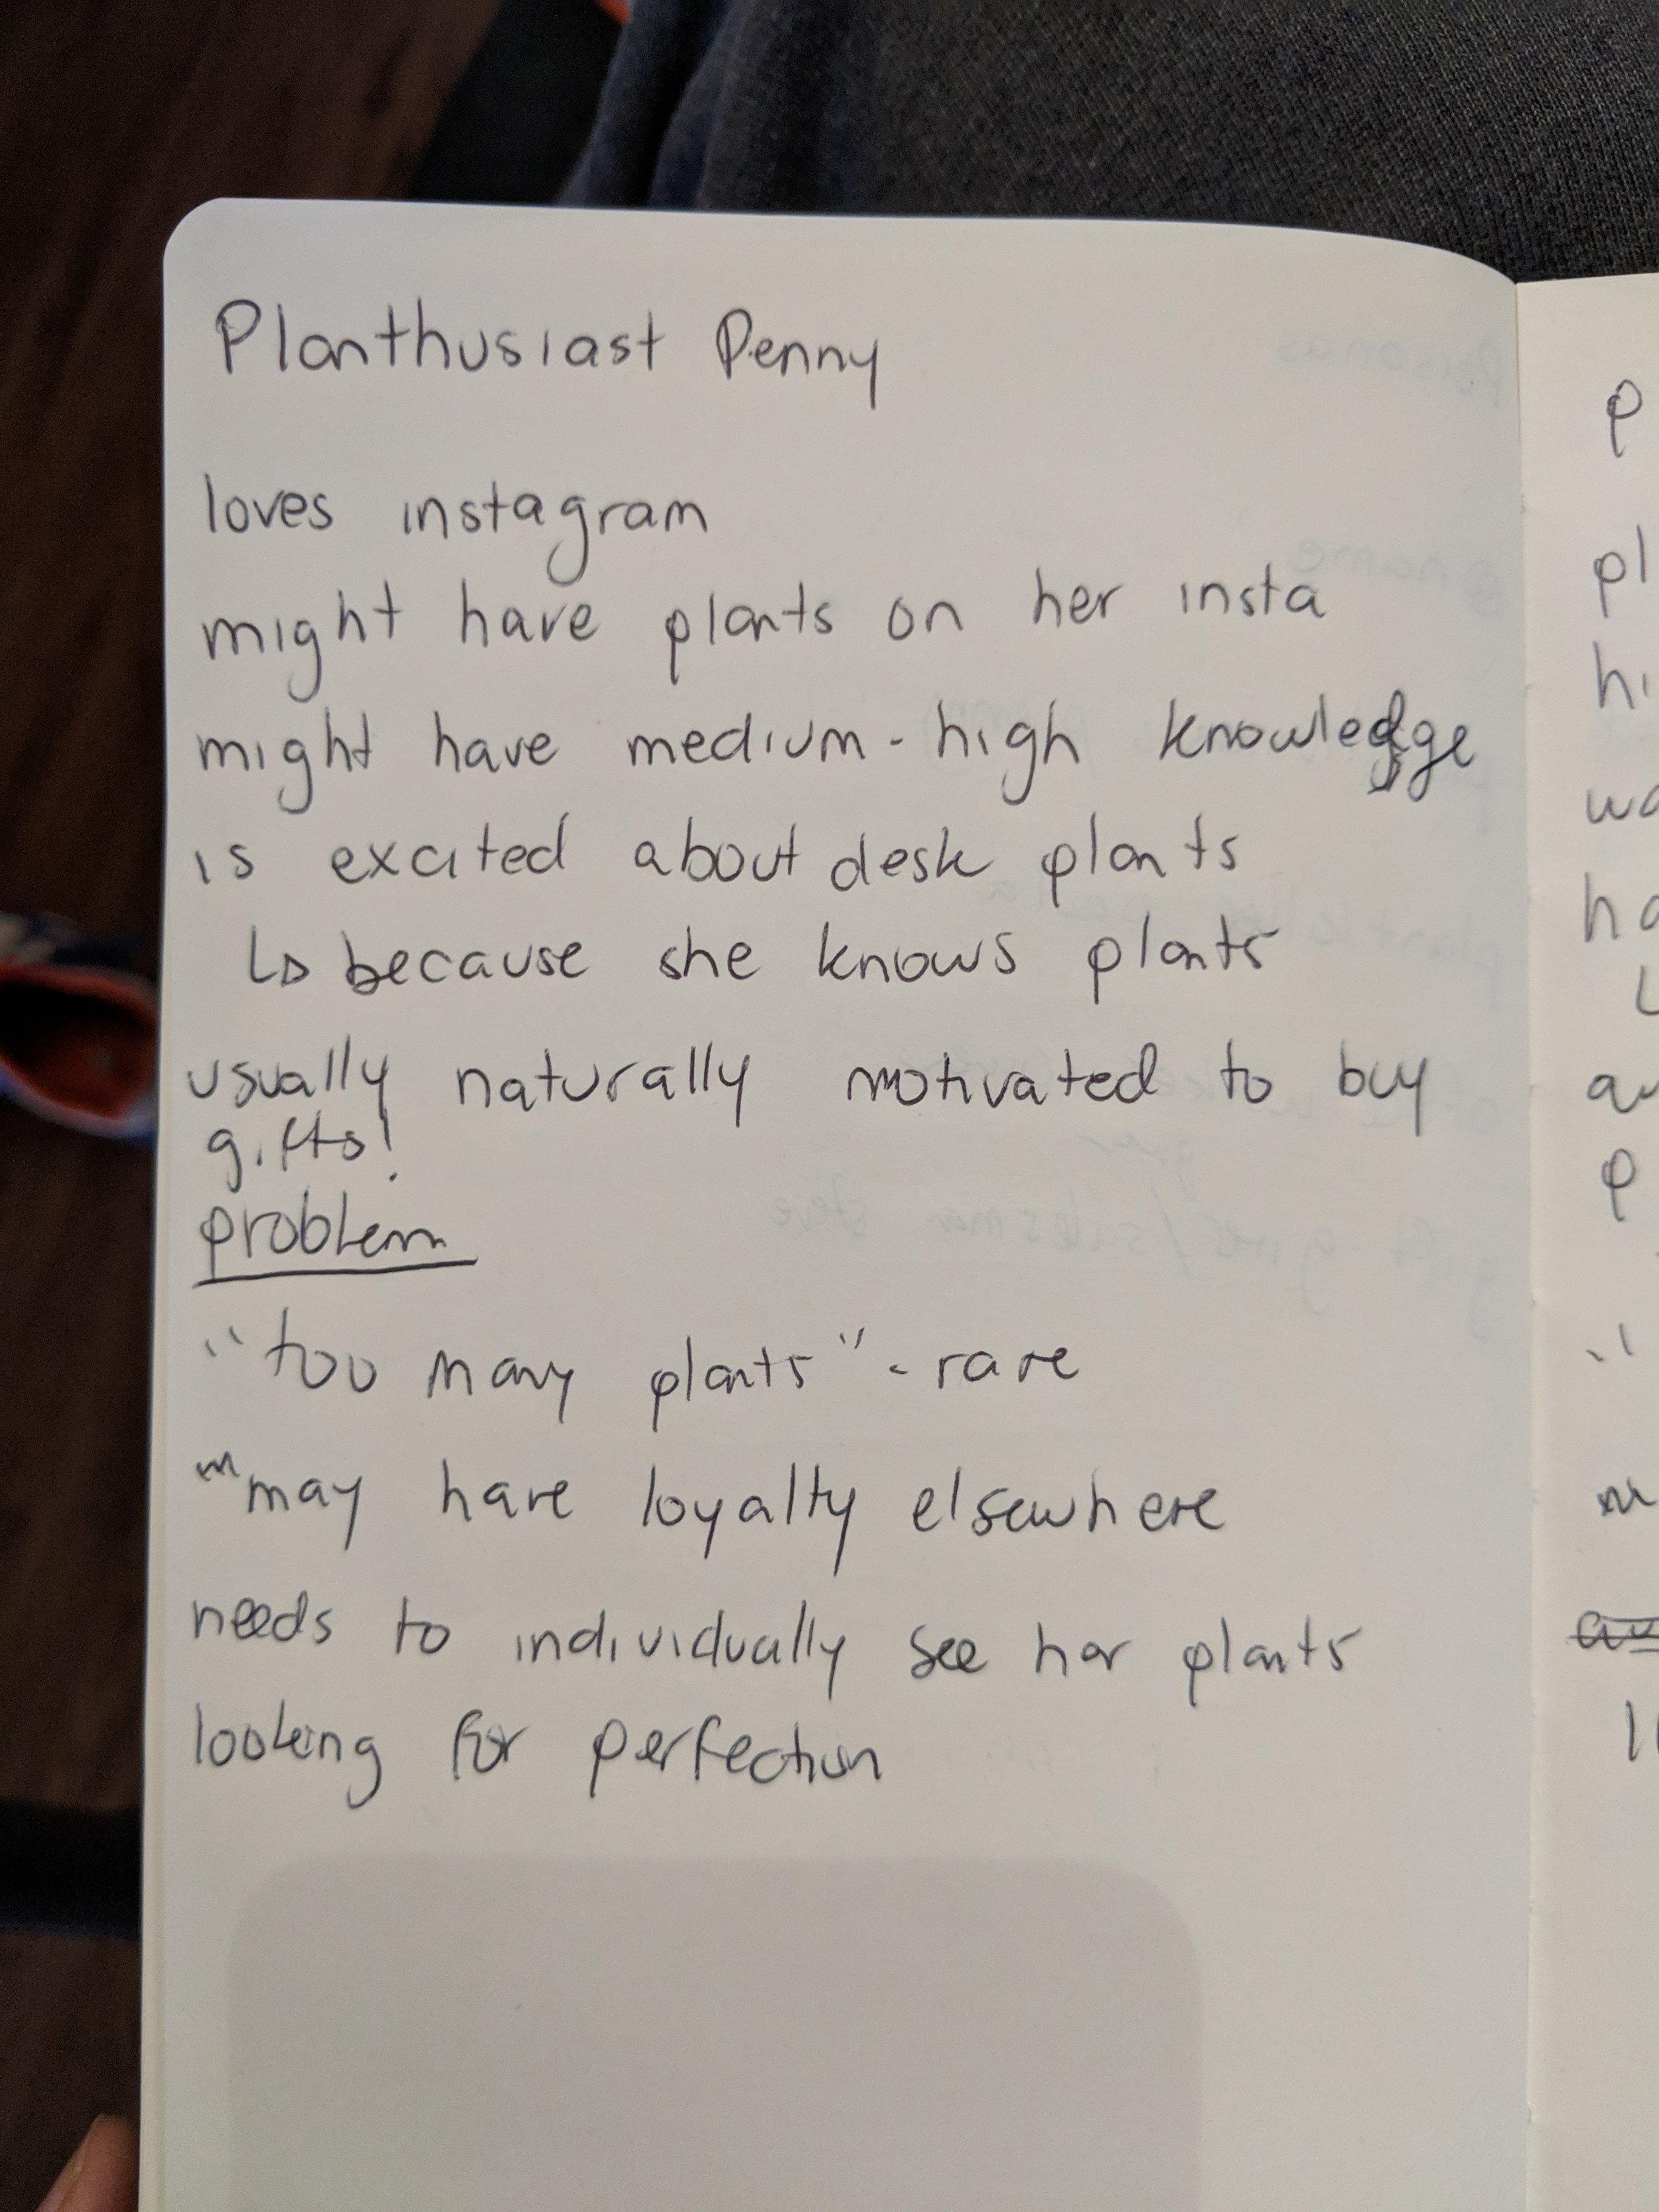 Planthusiast Penny